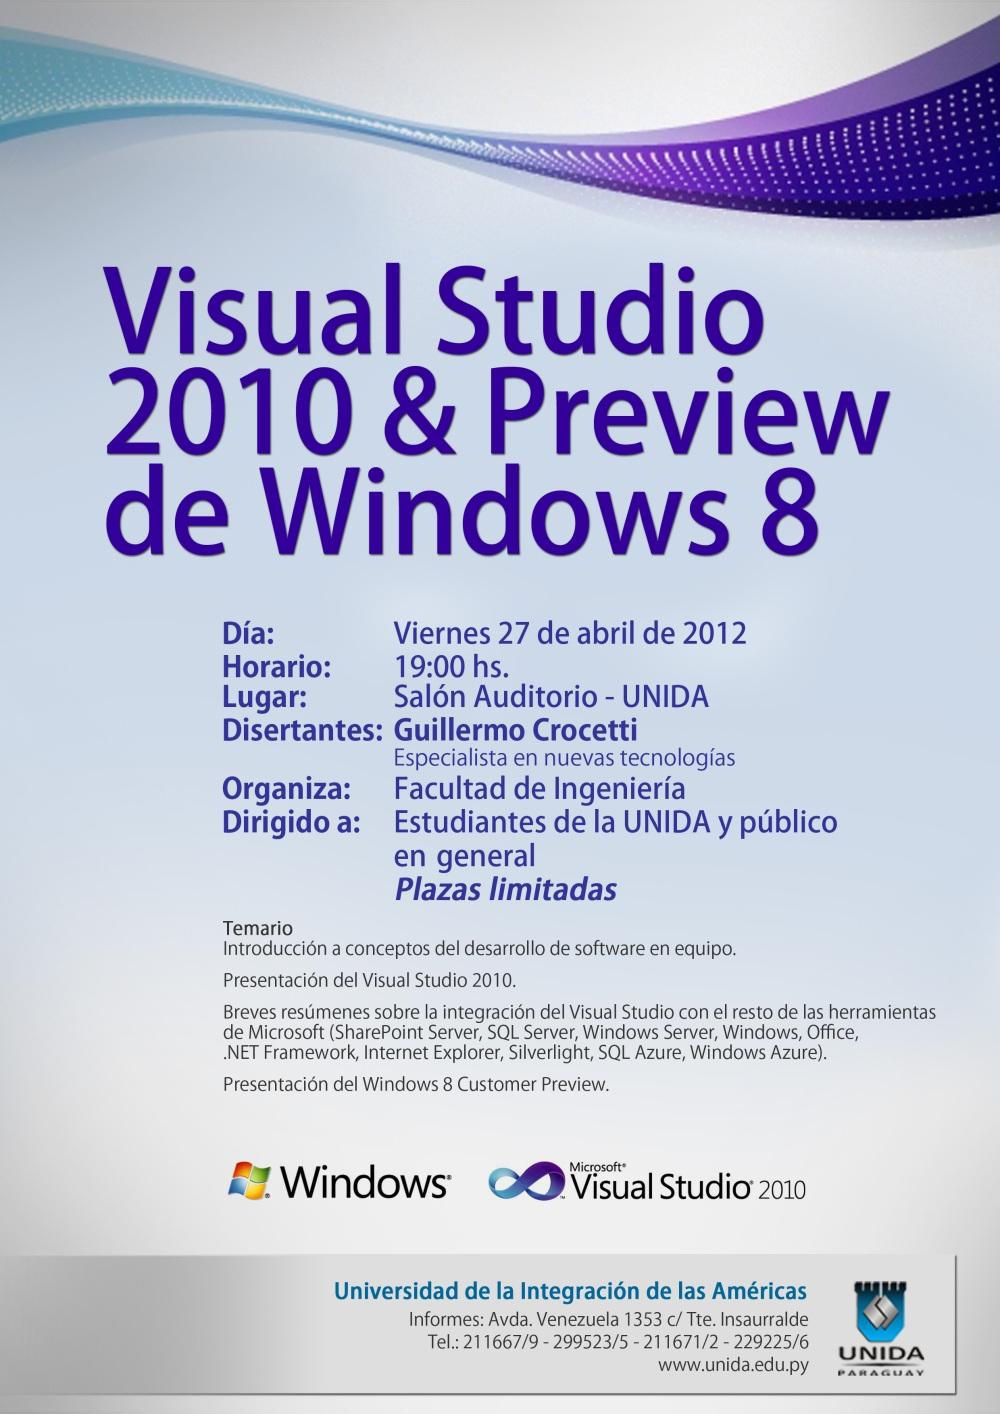 Visual Studio 2010 & Preview de Windows 8 copia